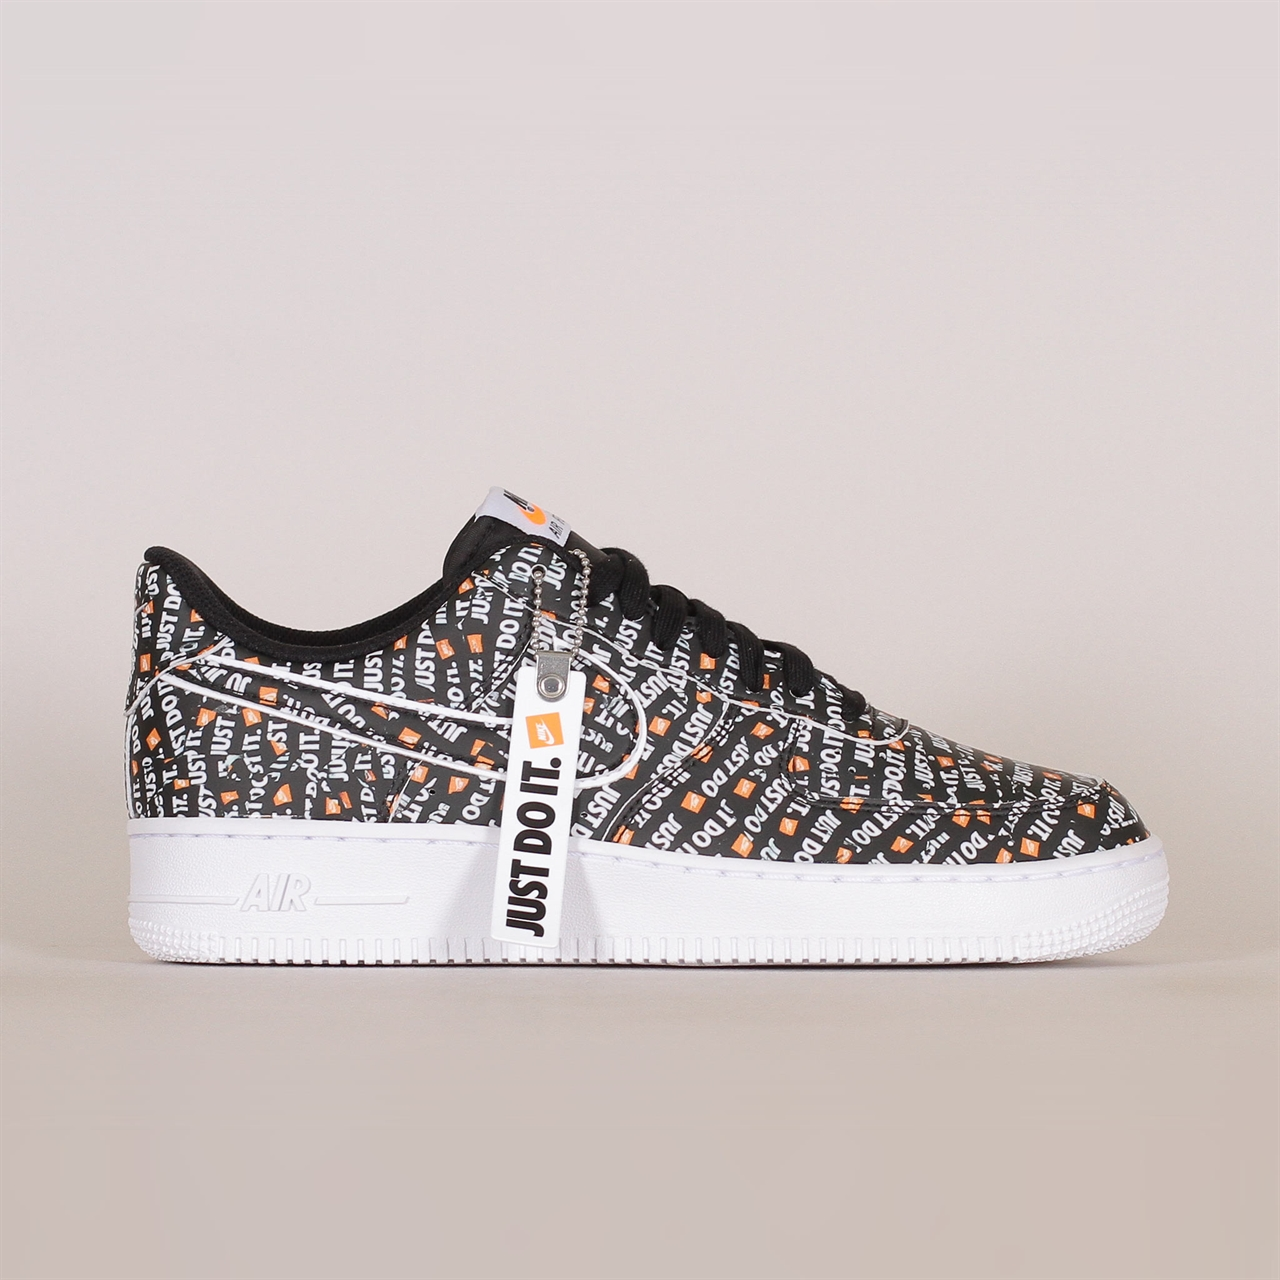 cheap for discount b0854 9b165 Shelta - Nike Sportswear Air Force 1 07 LV8  Just Do It  (AO